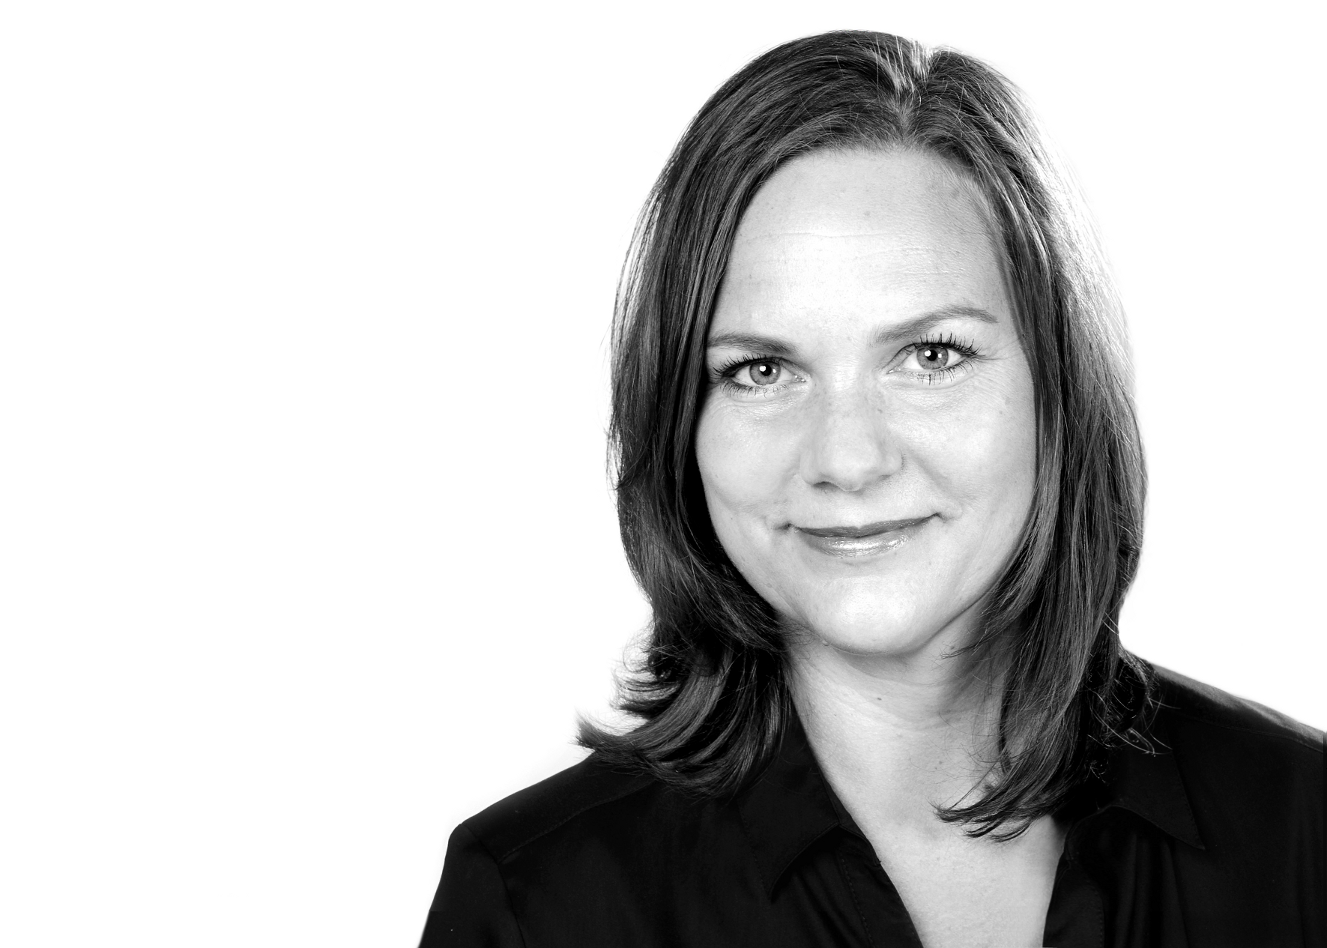 Jobina Schenk